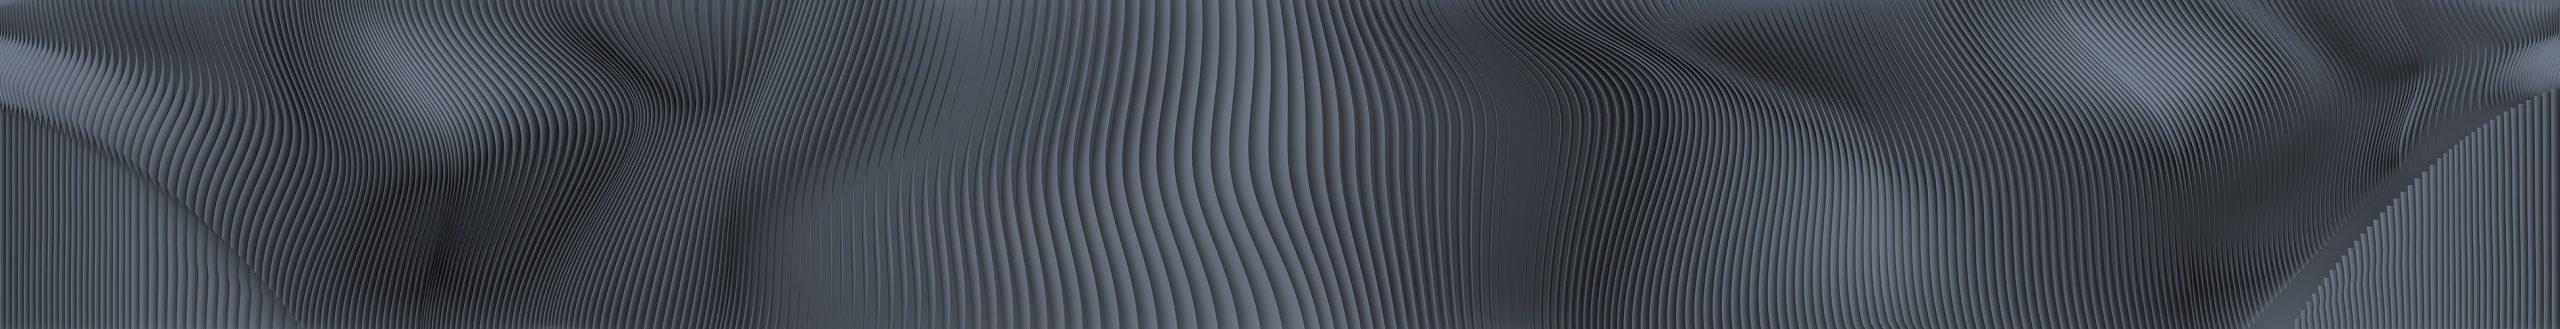 Flow dark full - wall mural - wallpaper